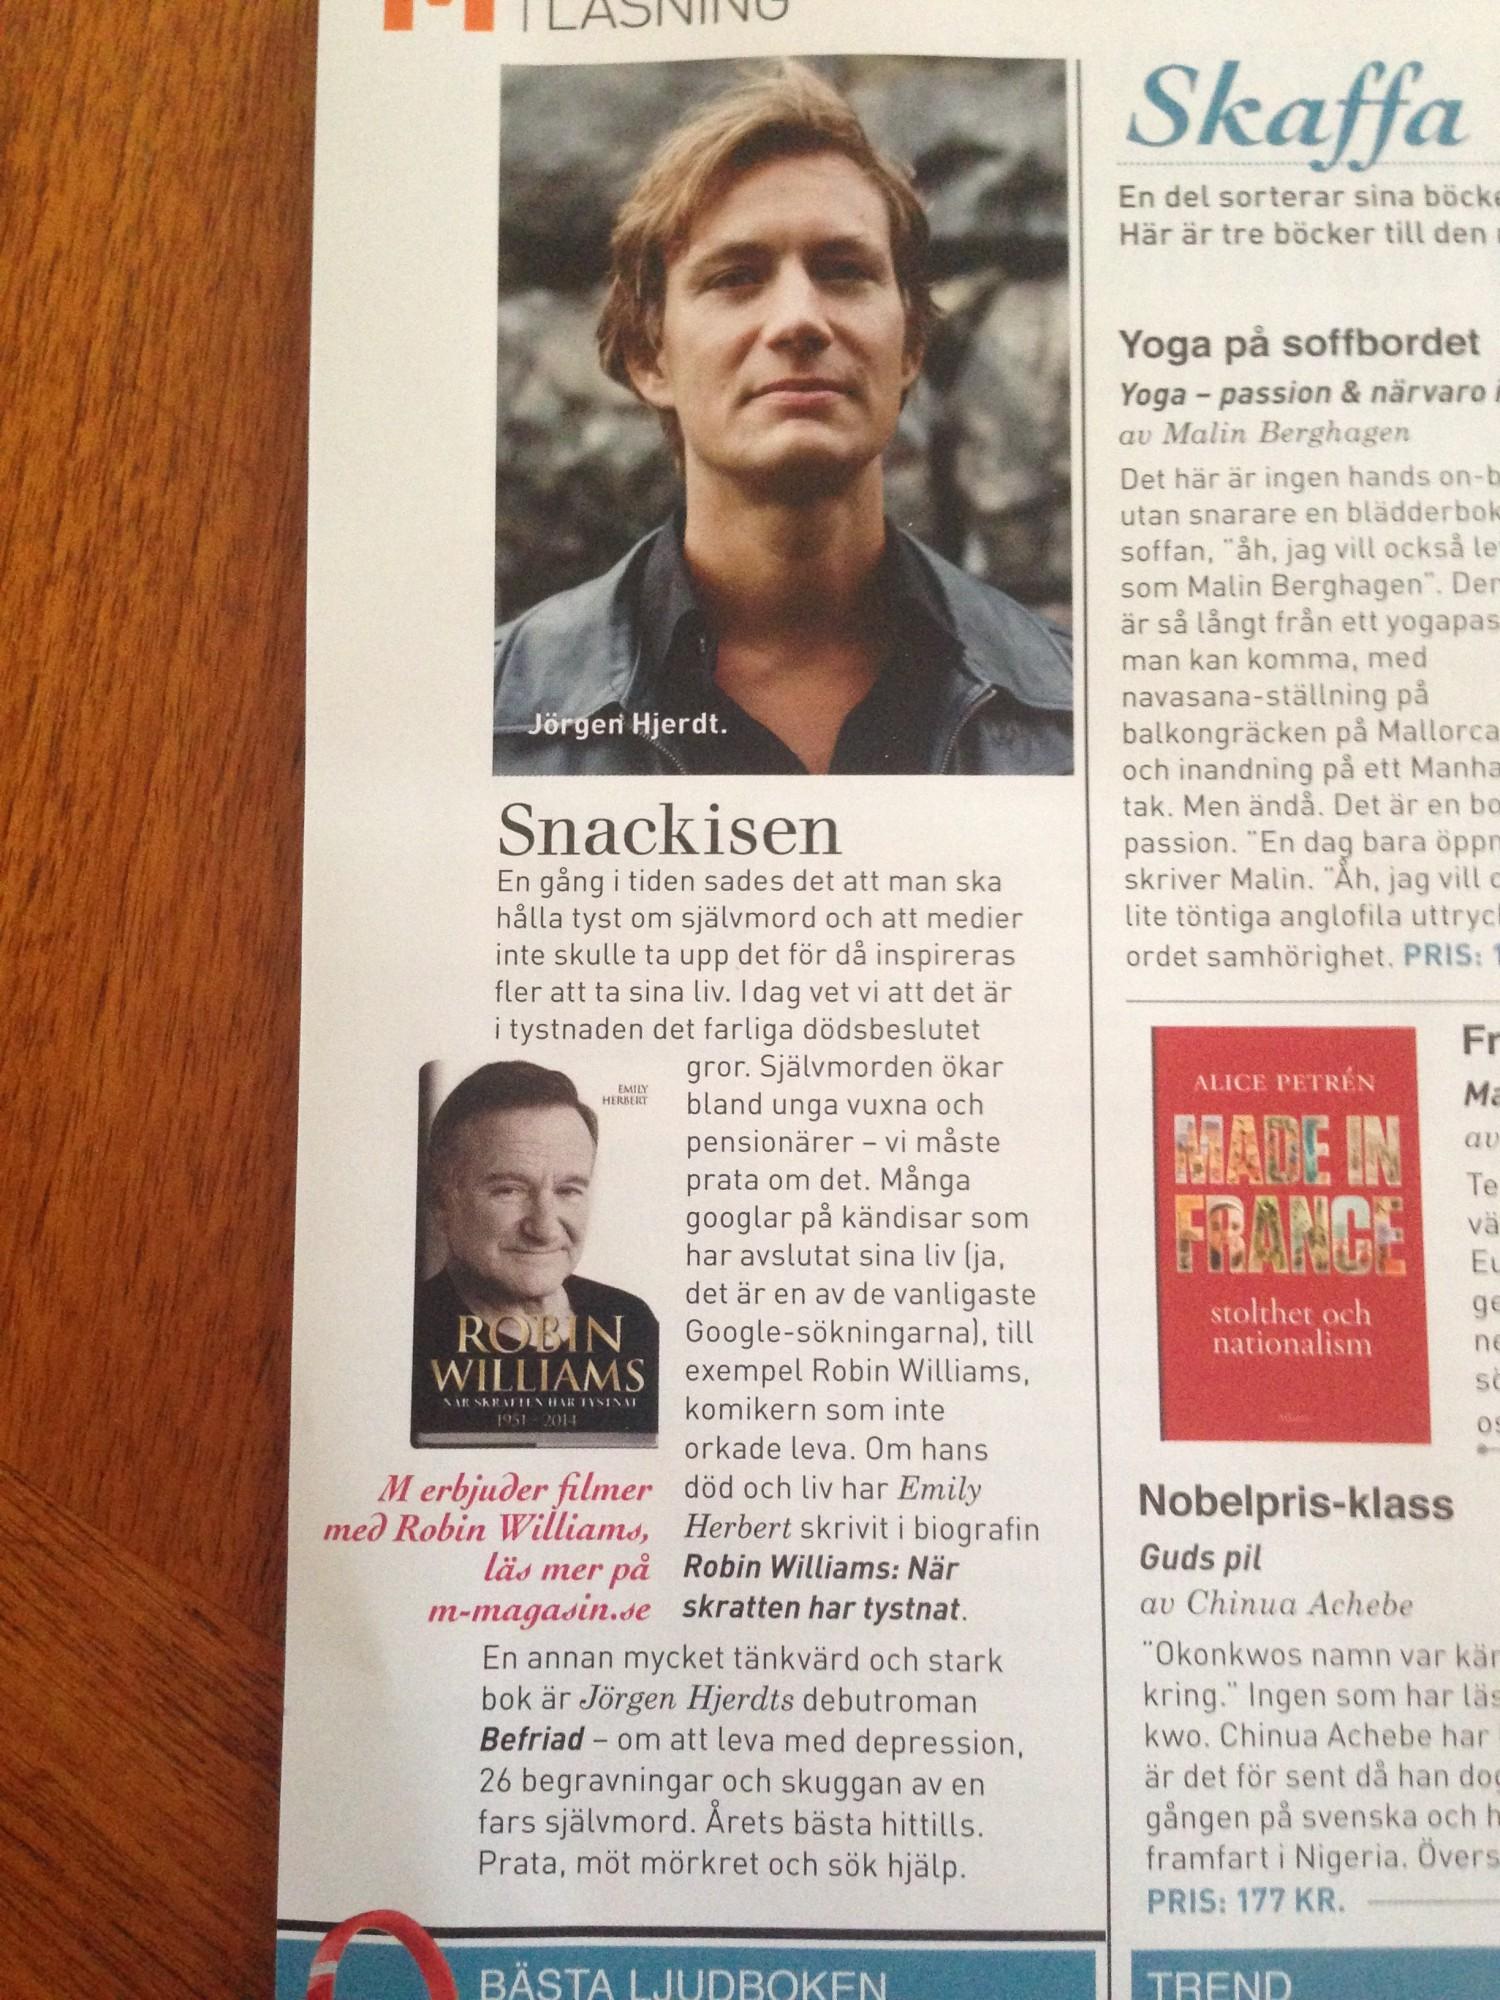 Befriad, Jörgen Hjerdt, M Magasin